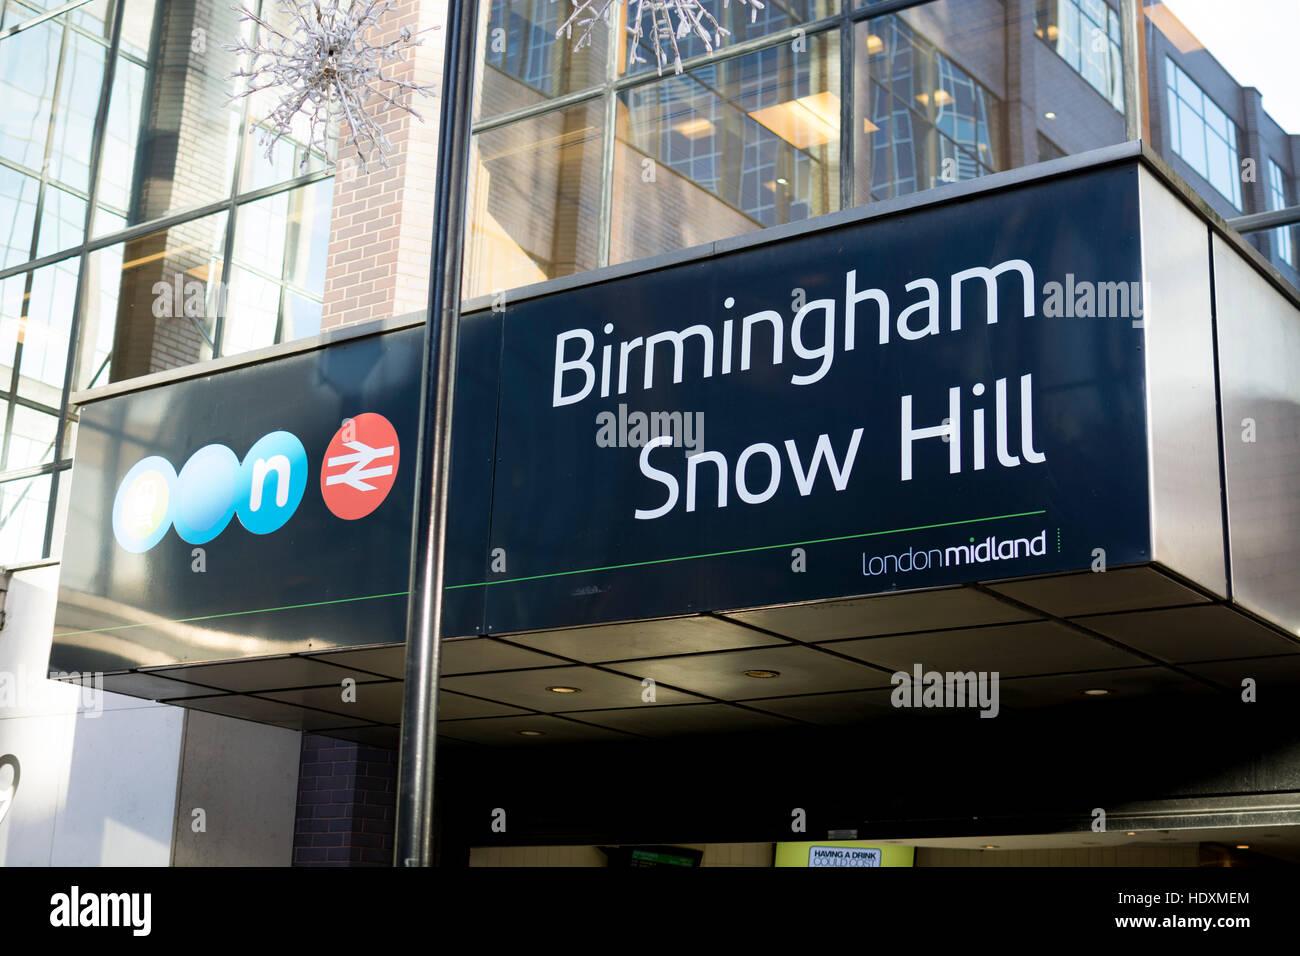 Snow Hill railway station, Birmingham, UK Stock Photo